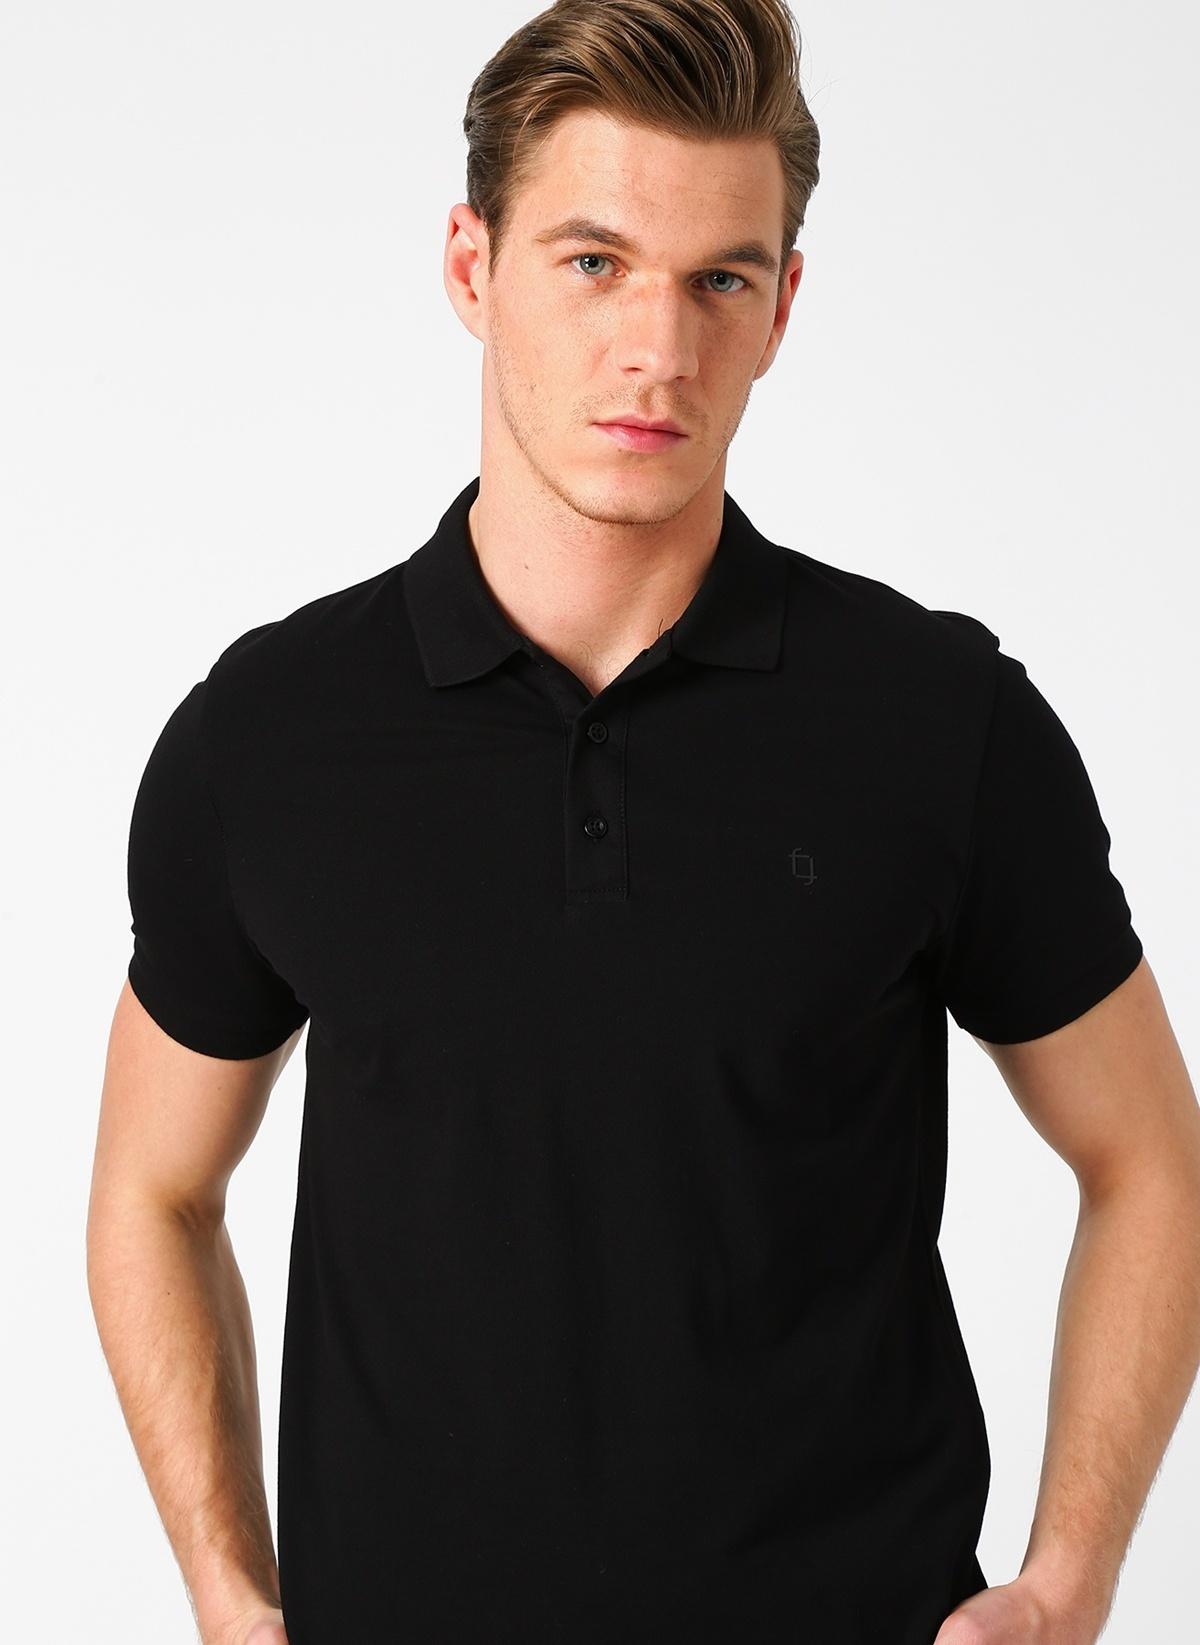 Fabrika Tişört 19-legolas-fabrika Polo T-shirt – 99.95 TL